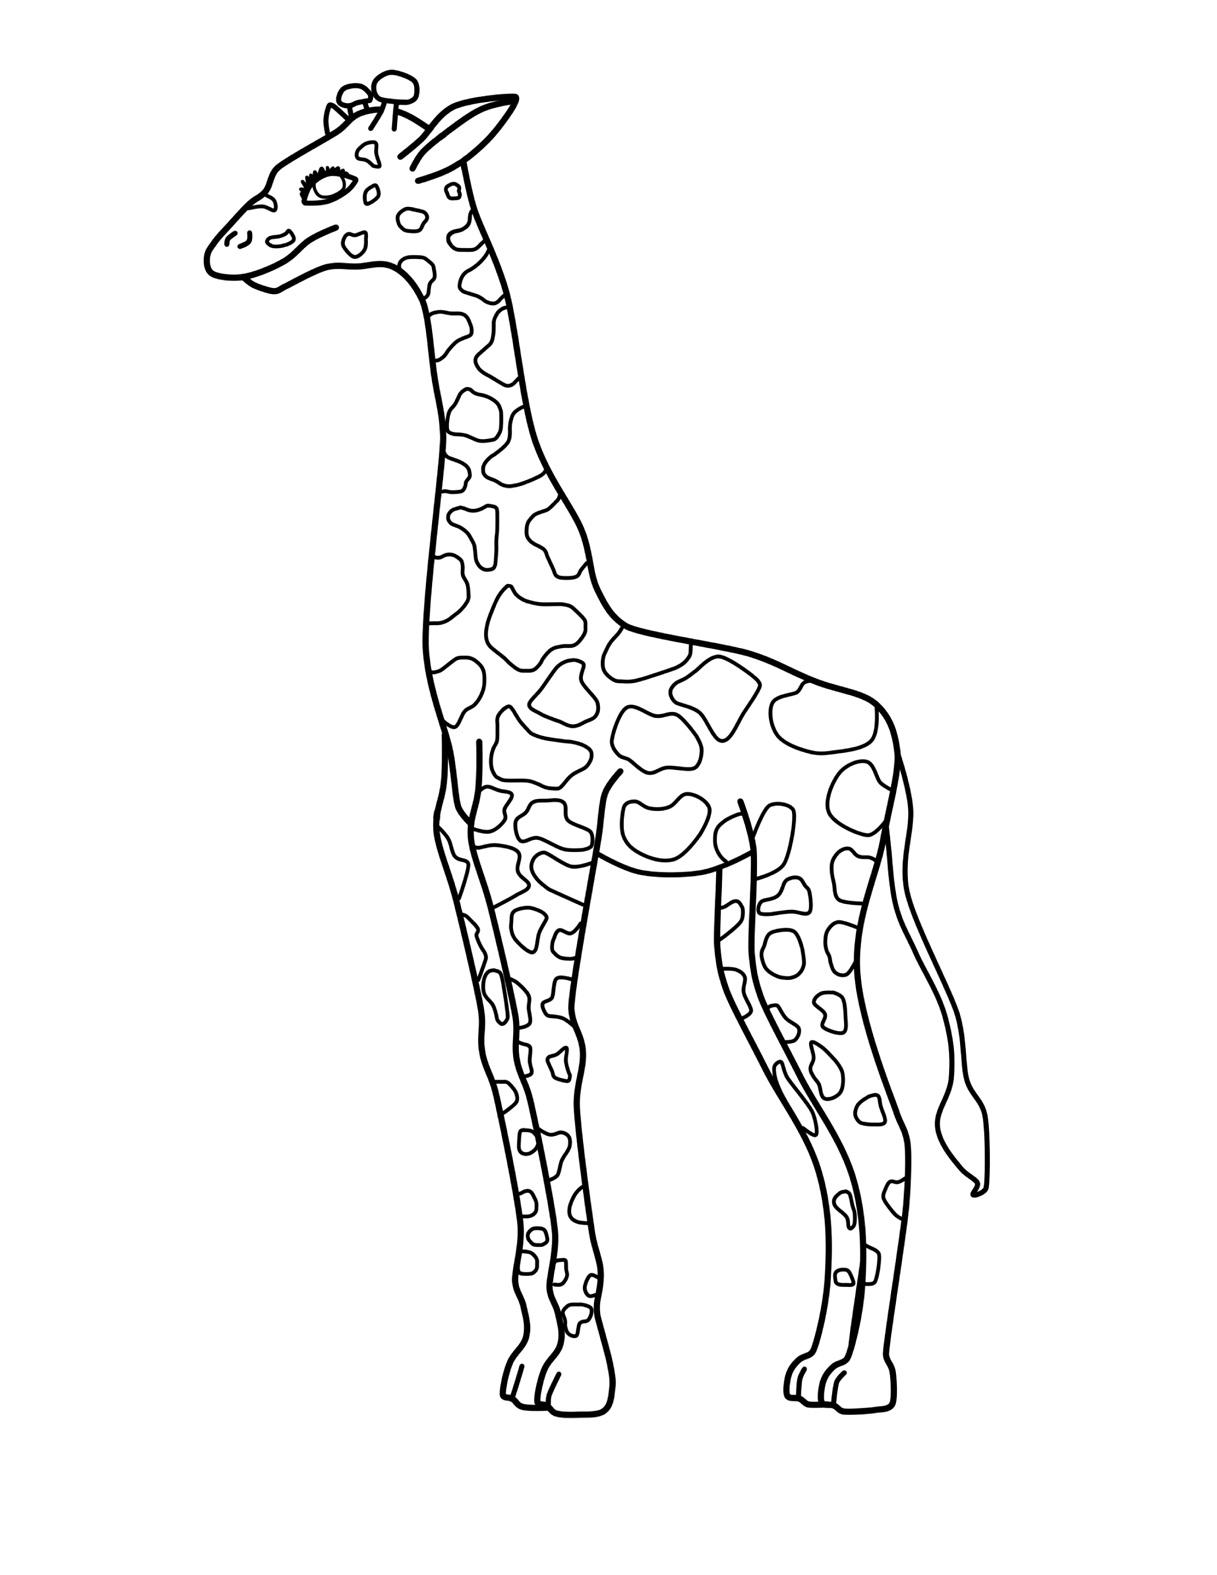 1217x1575 Giraffe Clipart Colouring Page